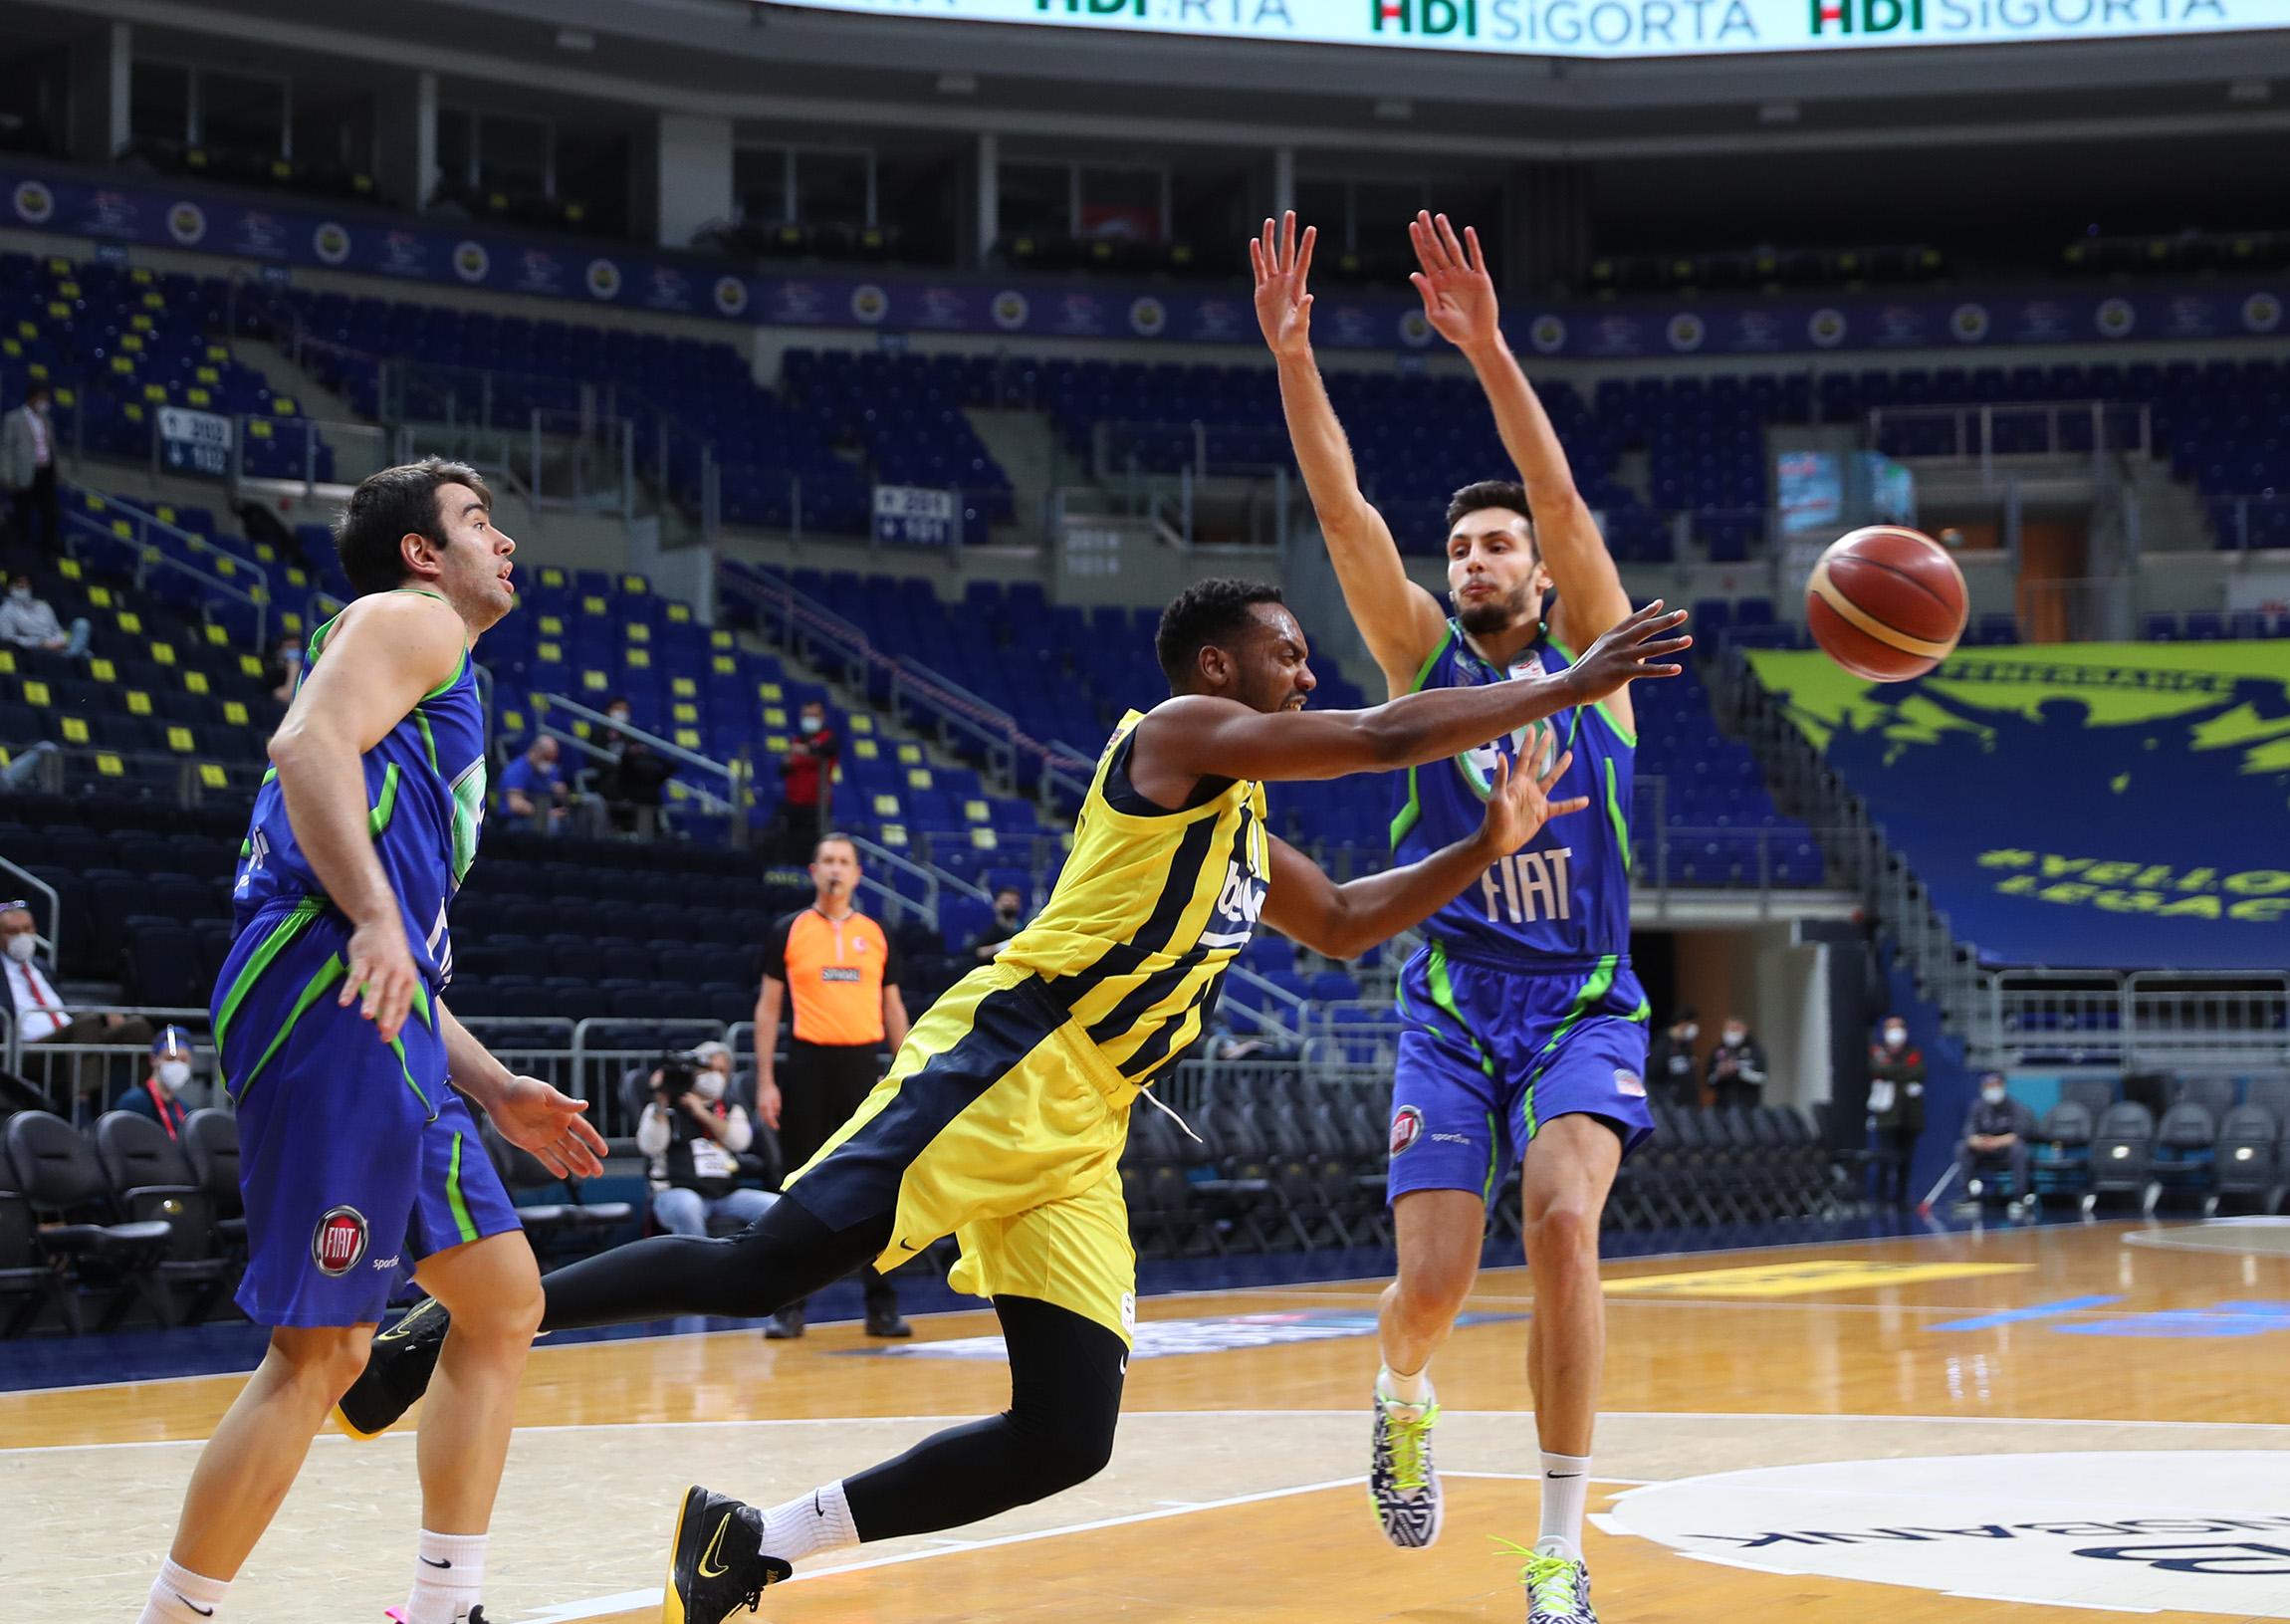 Fenerbahçe Beko 81-84 Tofaş